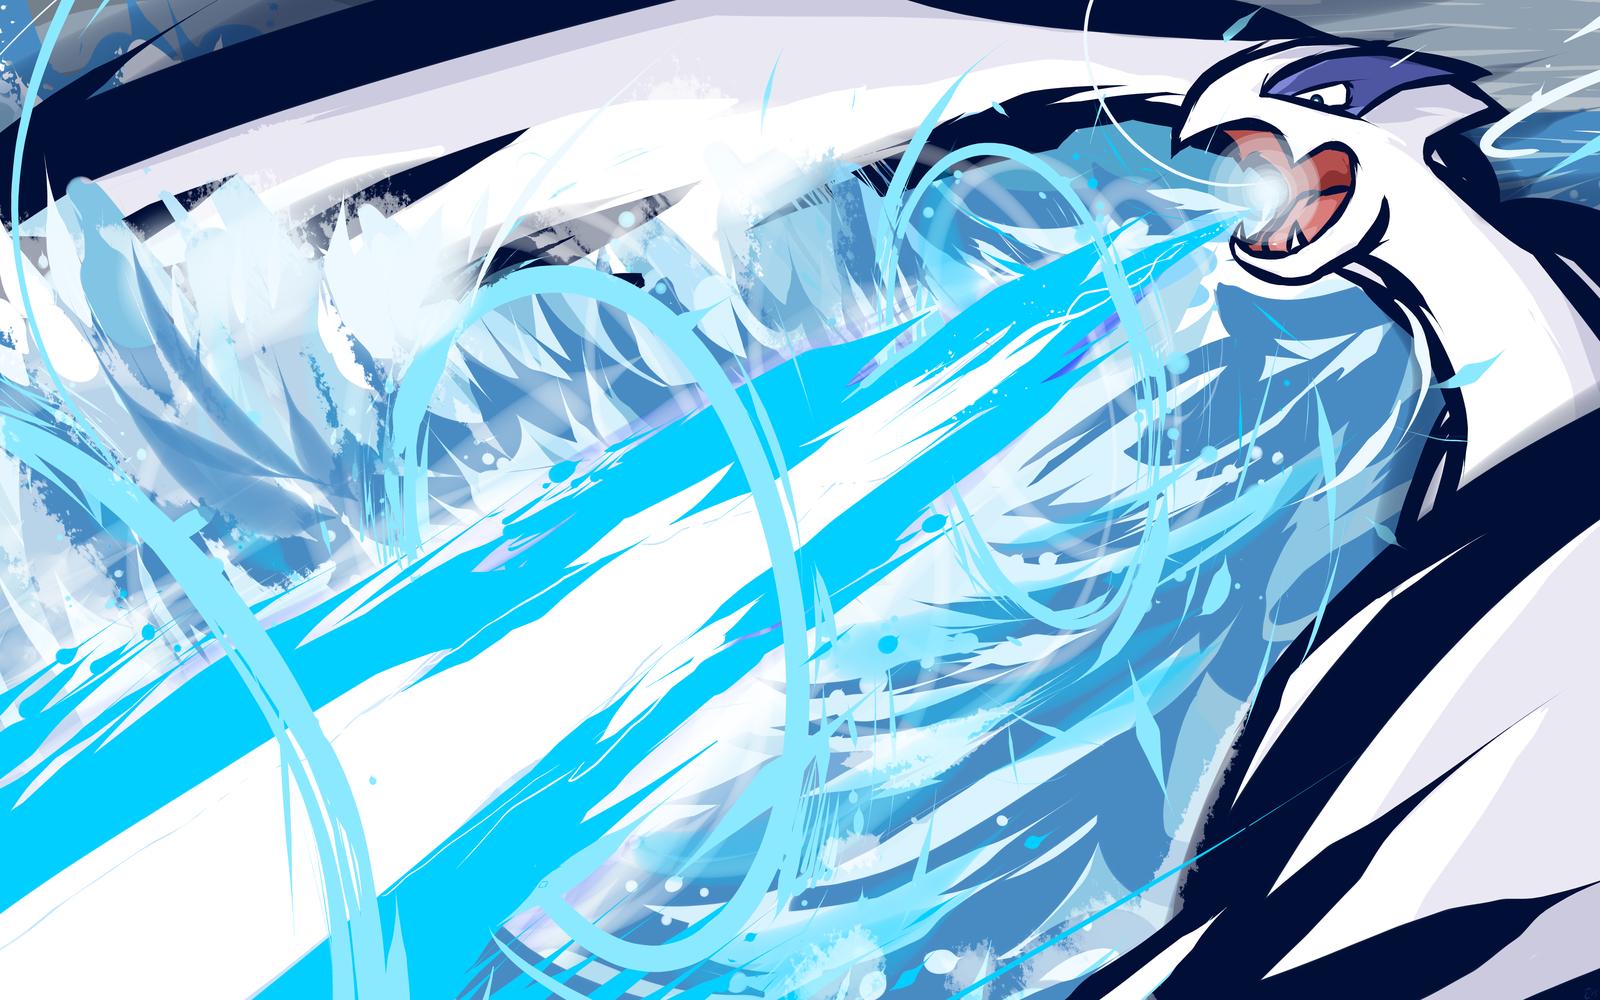 Hintergrundbilder Illustration Anime Pok Mon Lugia Ishmam